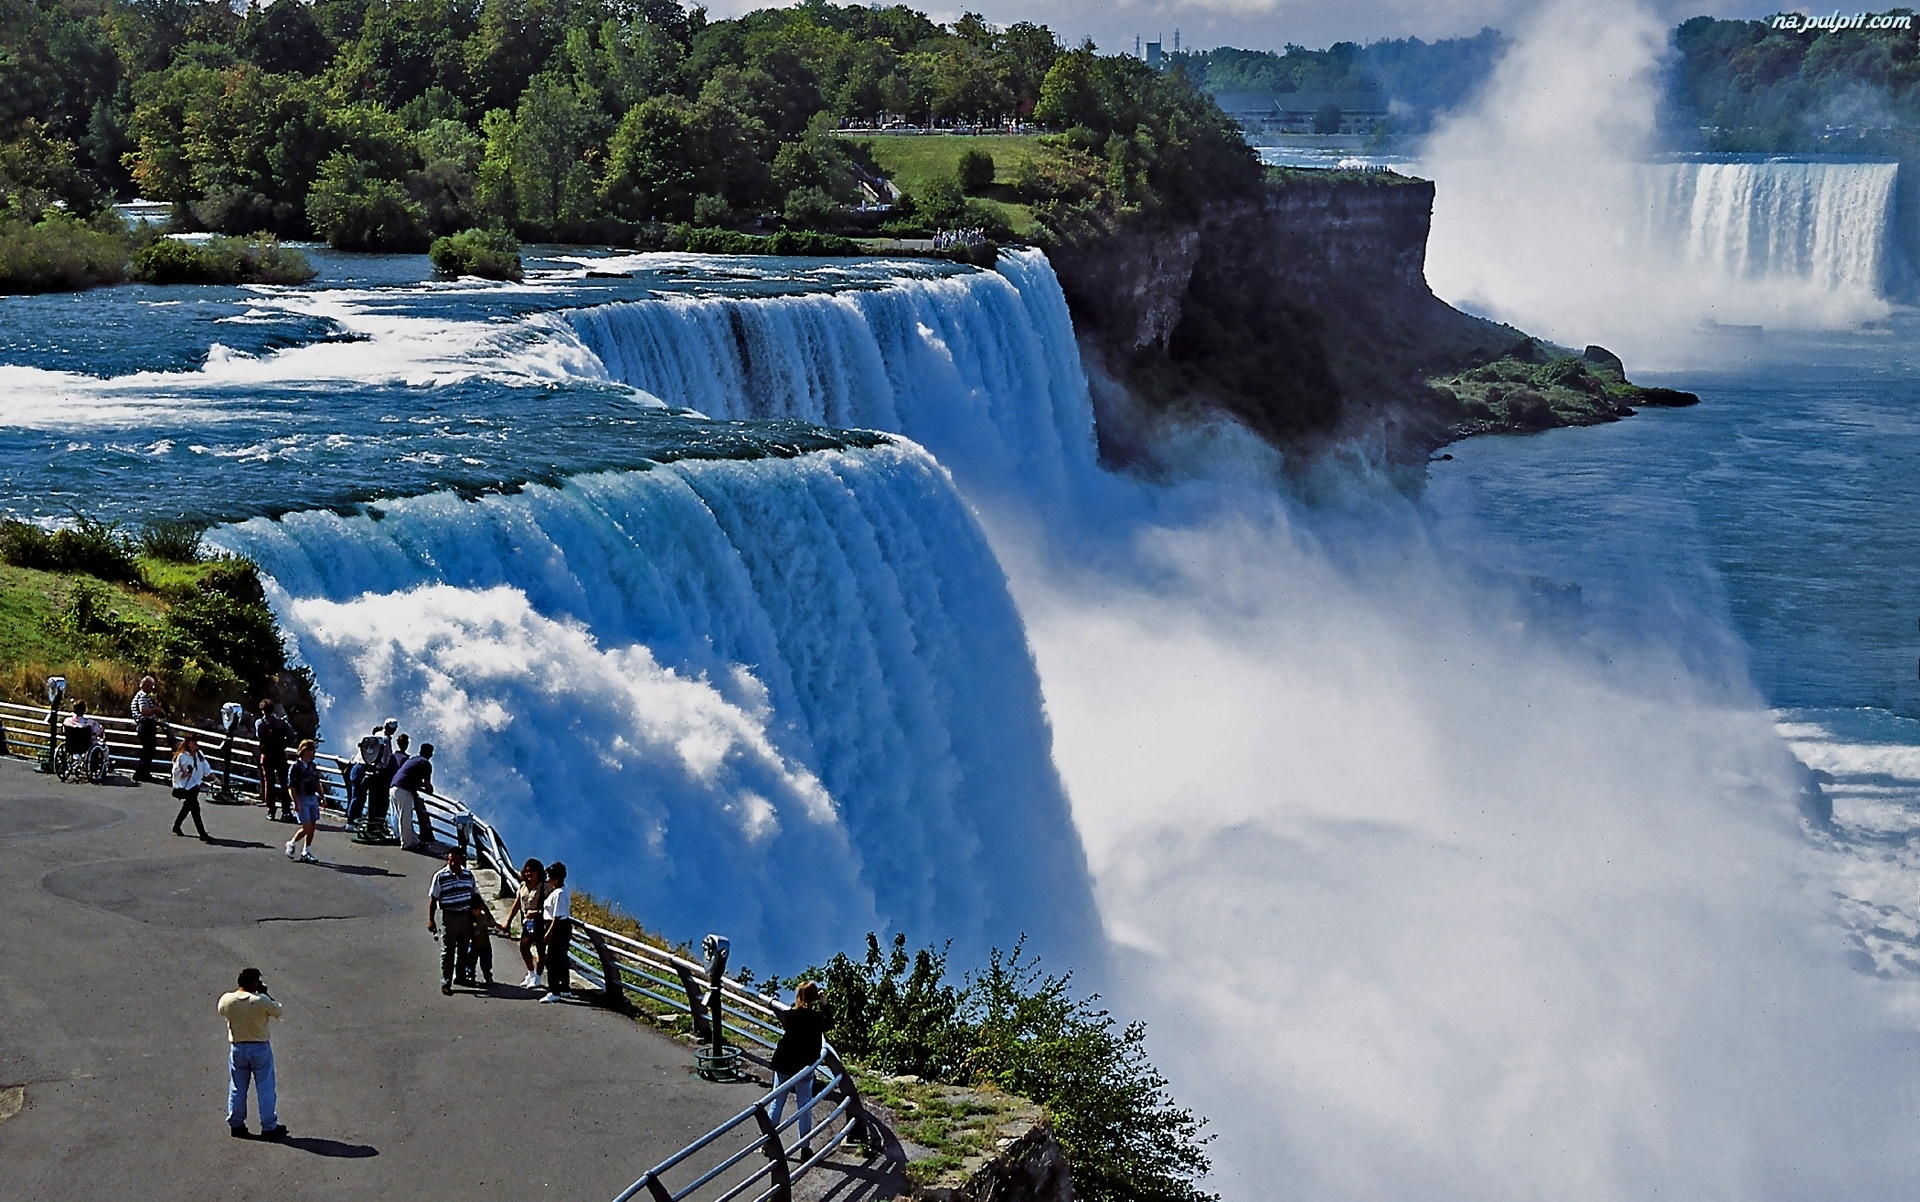 Widokowy, falls, niagara, kanada, taras